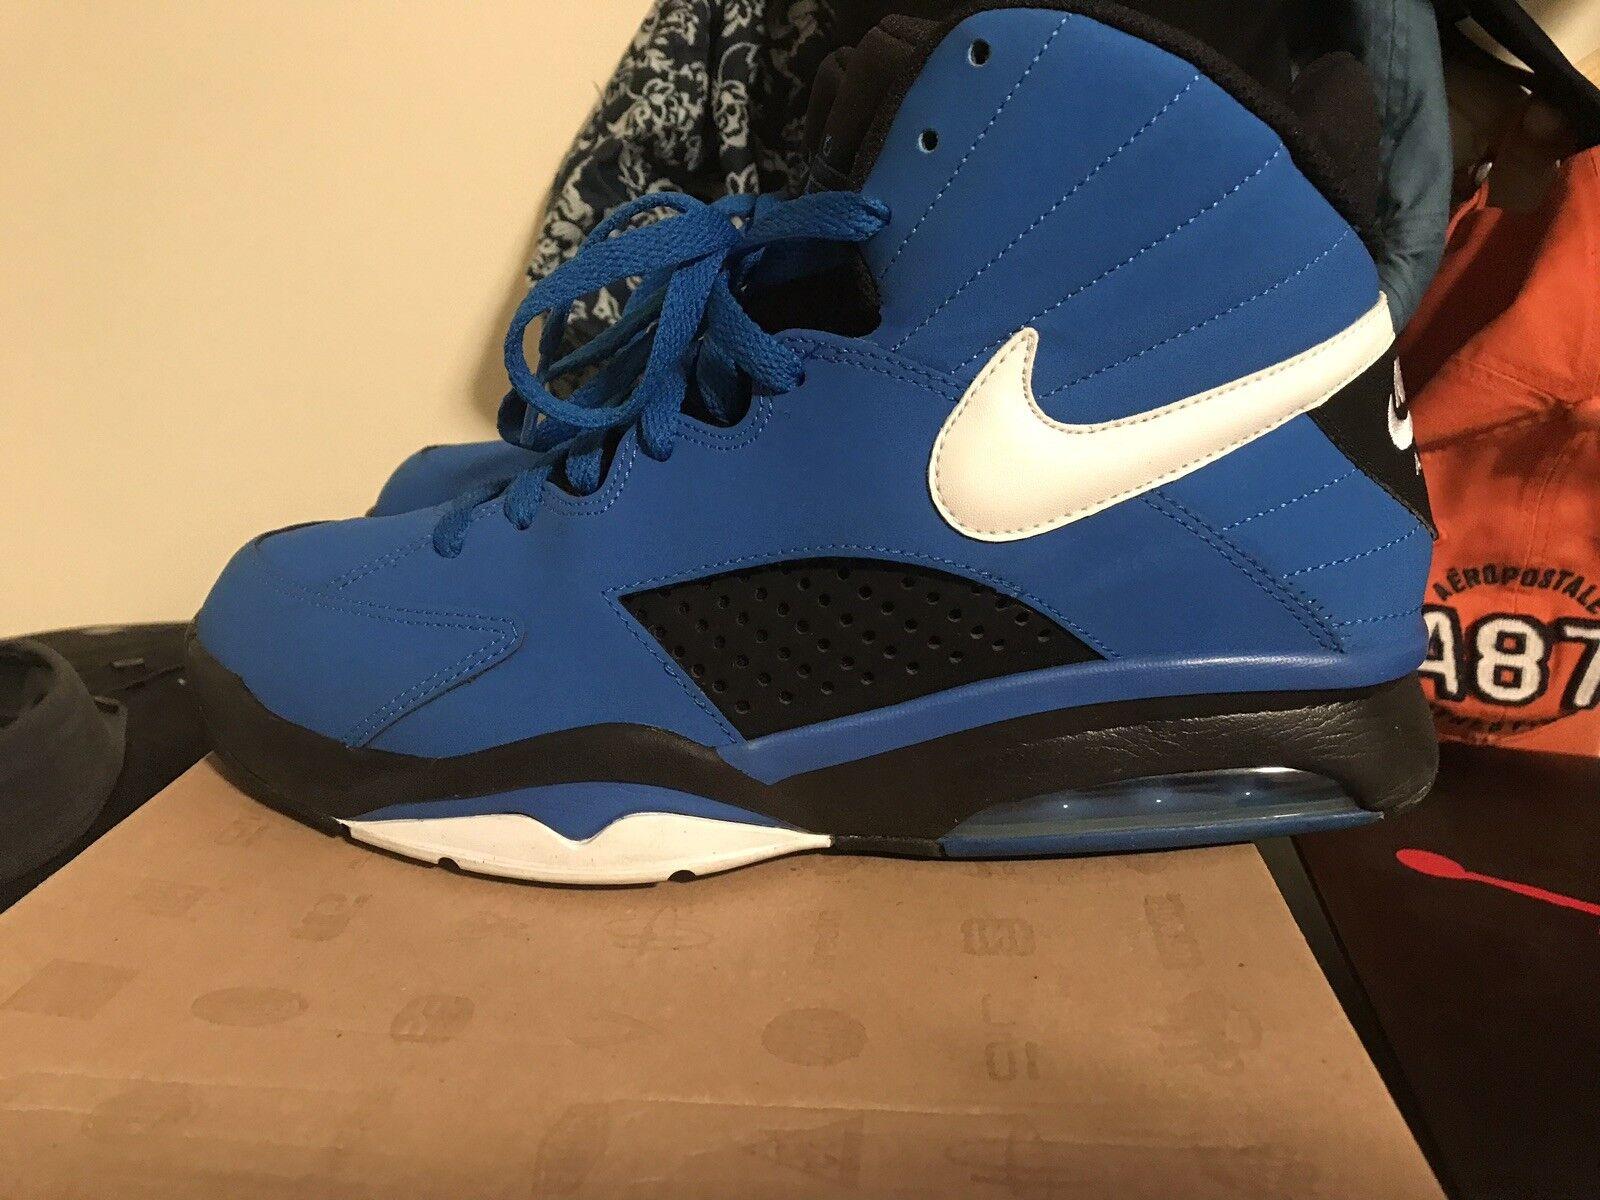 Nike Air Maestro bluee Black Size 8.5